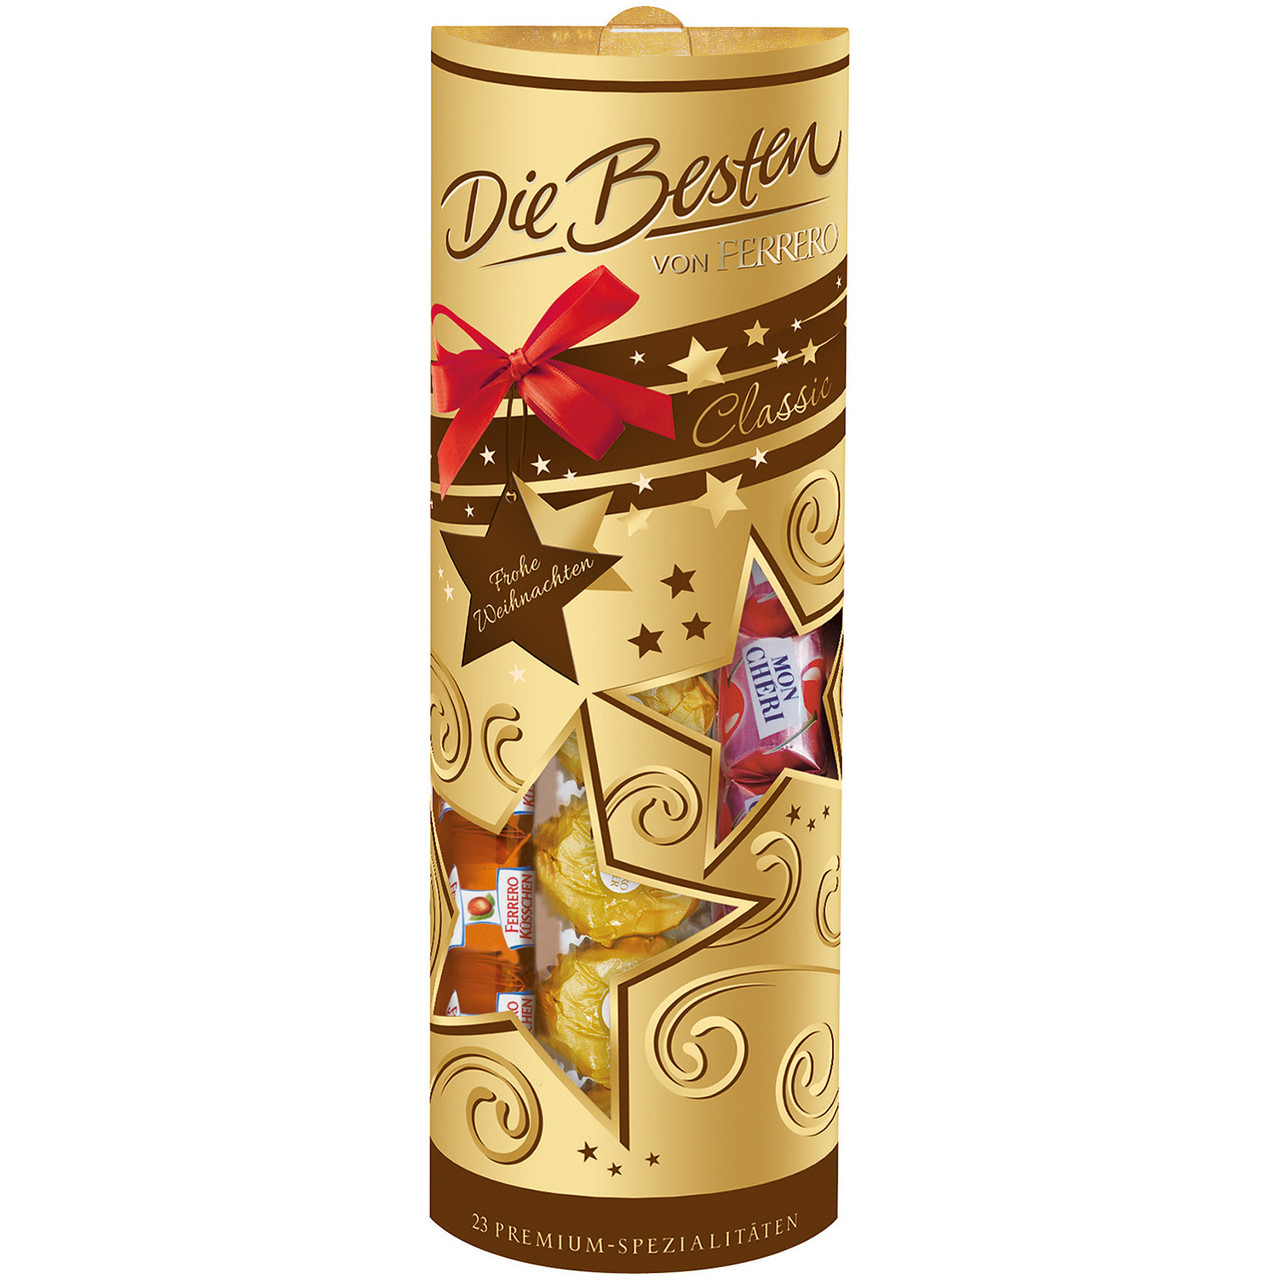 Ferrero Die Besten Тубус с конфетами 228g